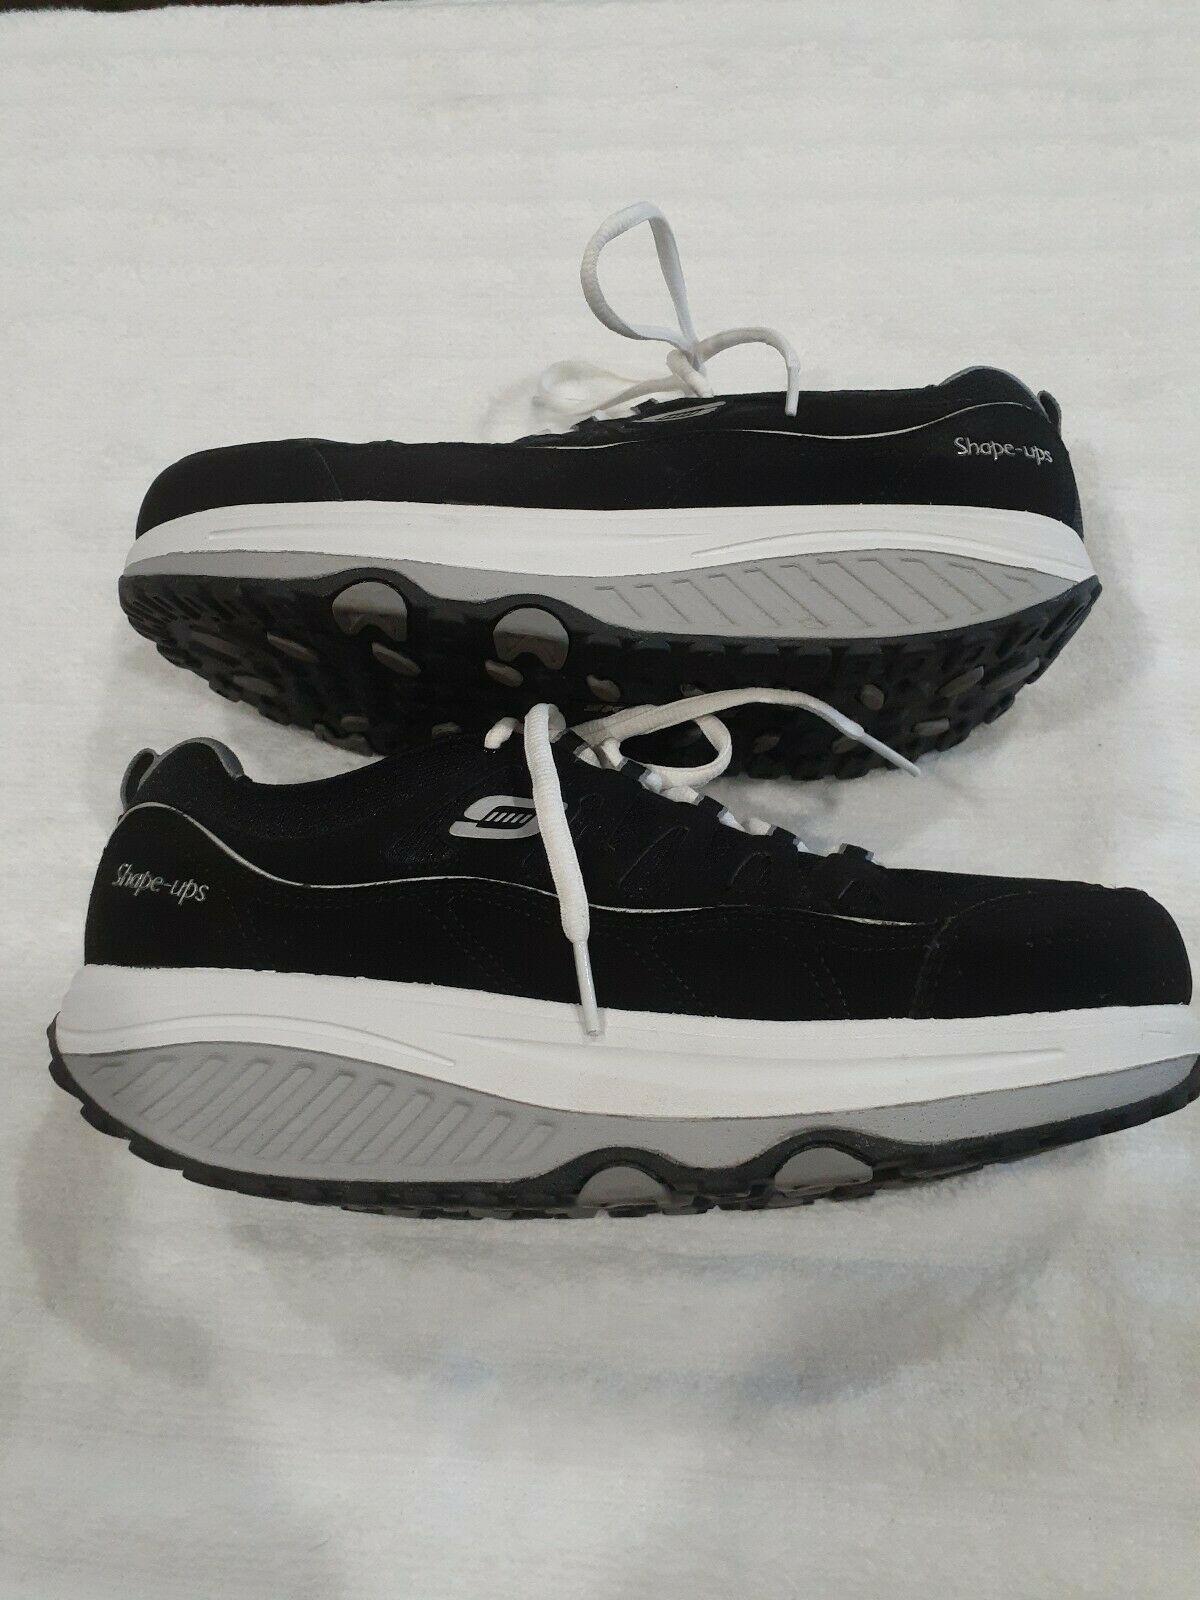 Womens Sz 9.5 M Skechers Shape-Ups Comfort Stride Shoes Sneakers Black & Silver image 3